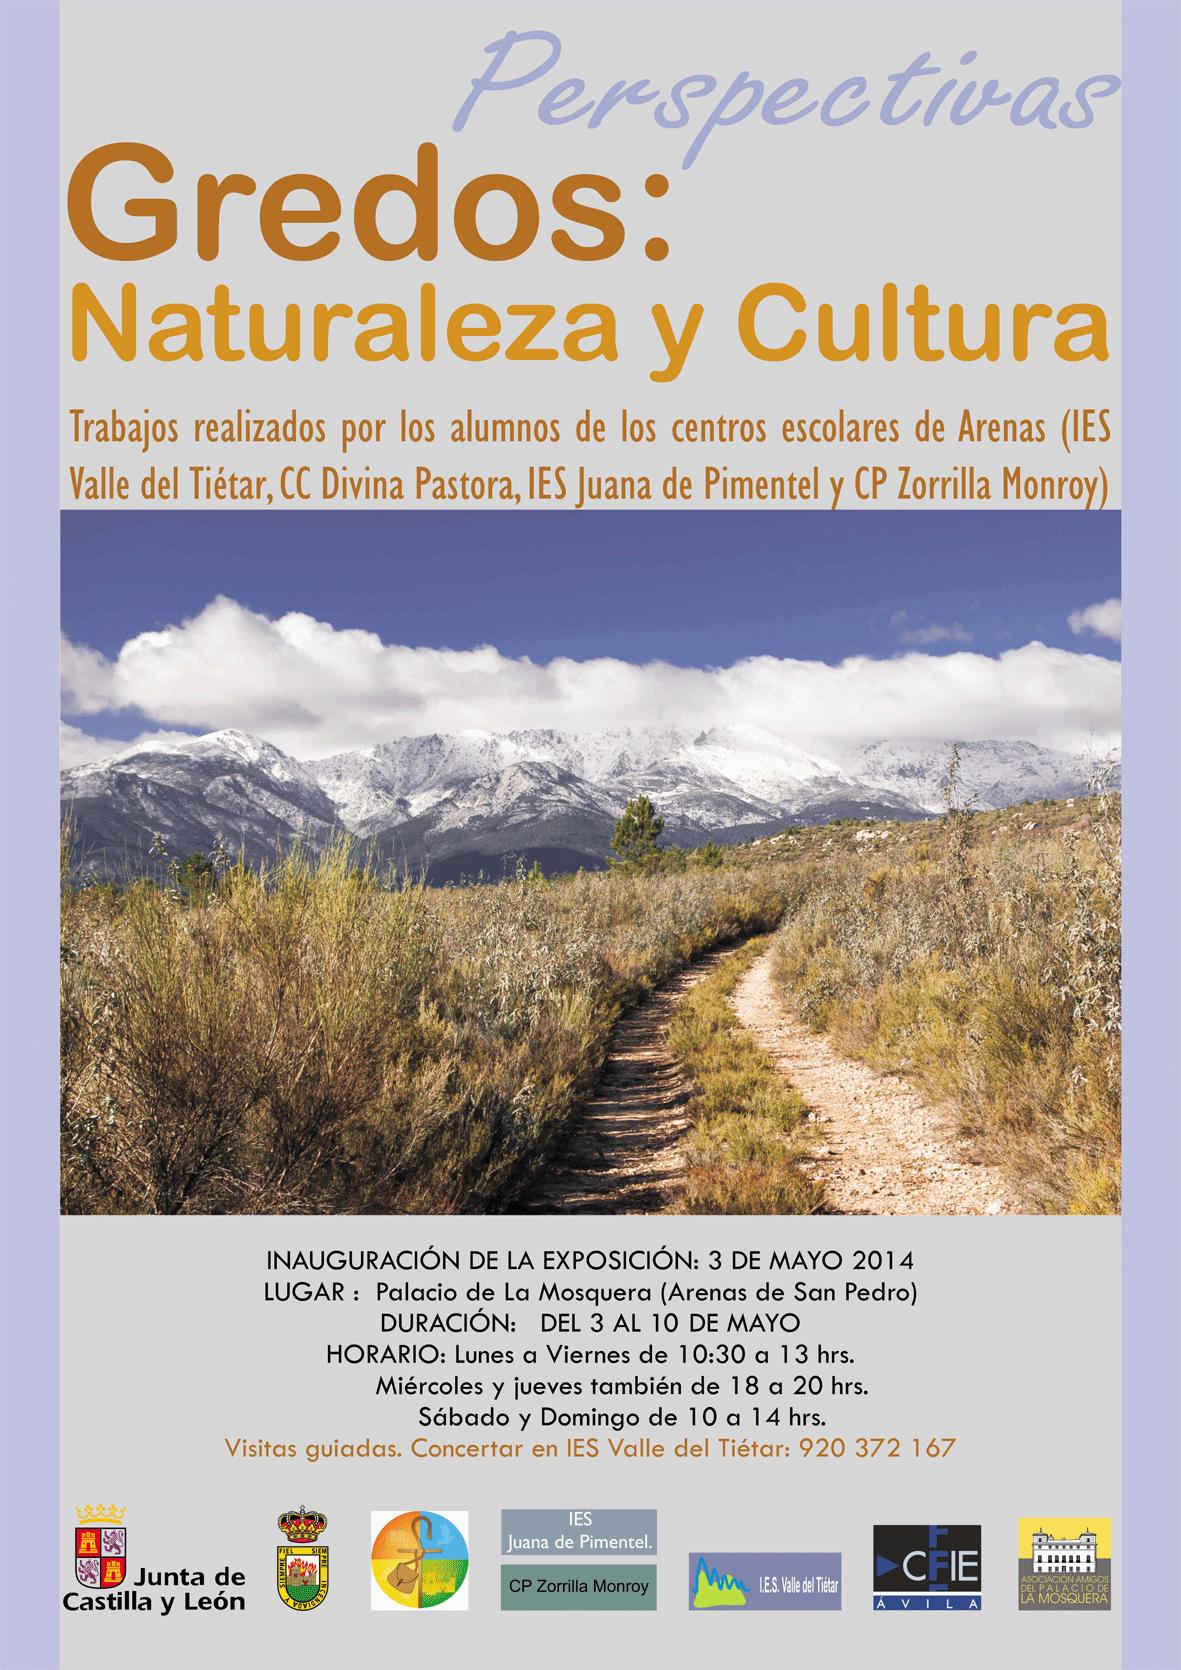 Exposición Gredos: Naturaleza y Cultura en Arenas de San Pedro - TiétarTeVe